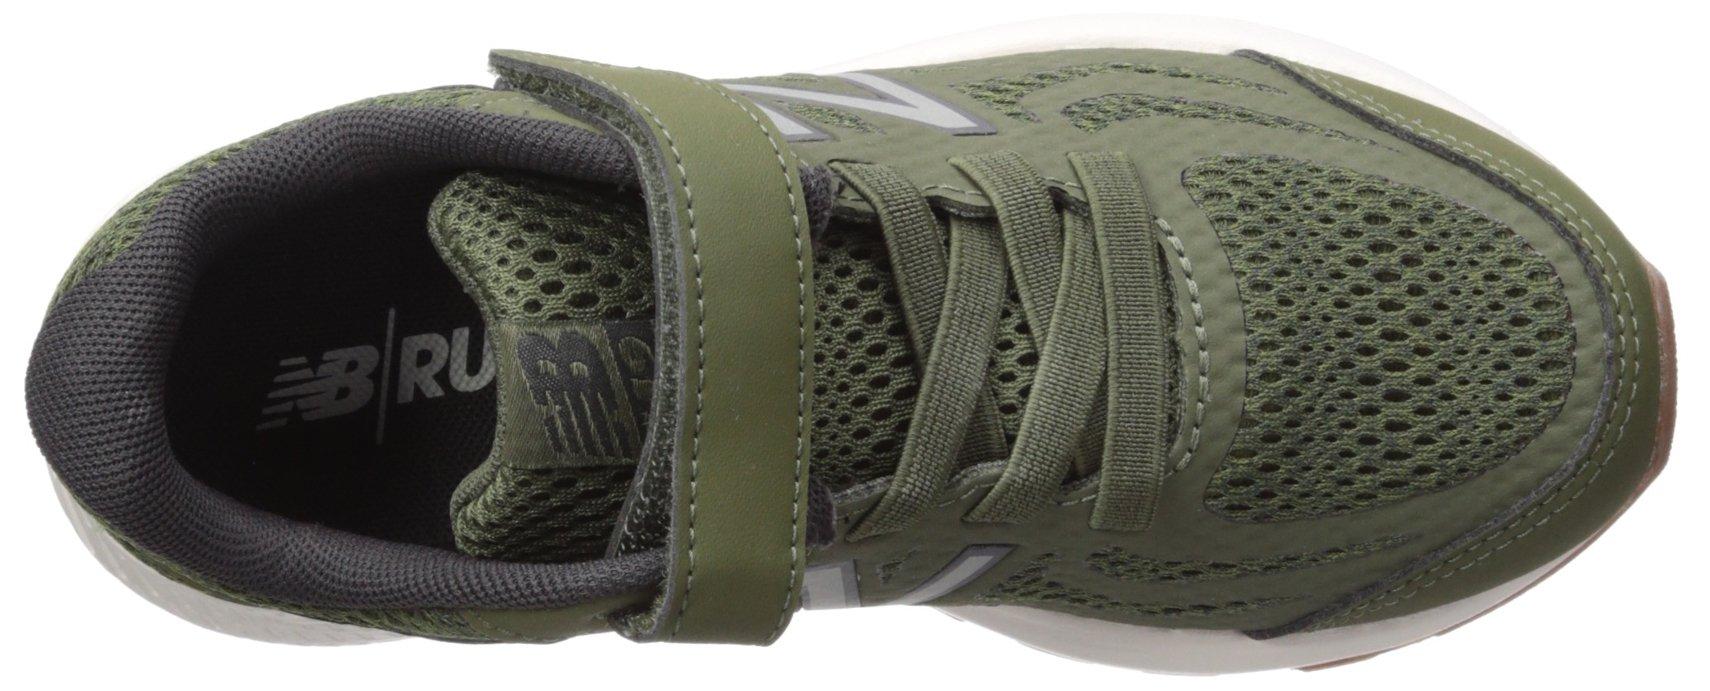 New Balance Boys' 519v1 Hook and Loop Running Shoe Dark Covert Green/Phantom 2 M US Infant by New Balance (Image #8)